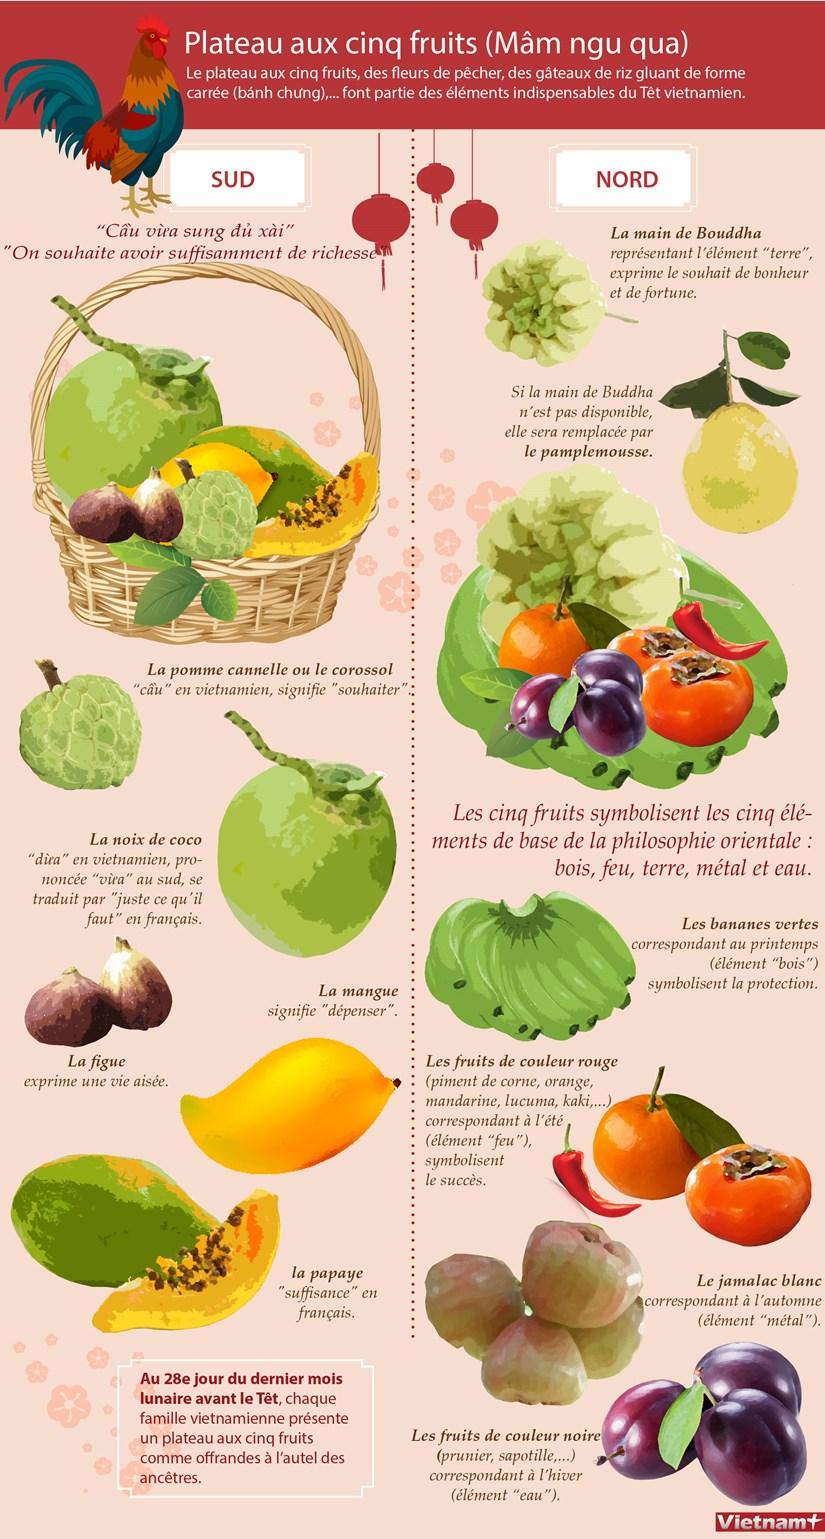 Plateau aux cinq fruits (Mam ngu qua) hinh anh 1